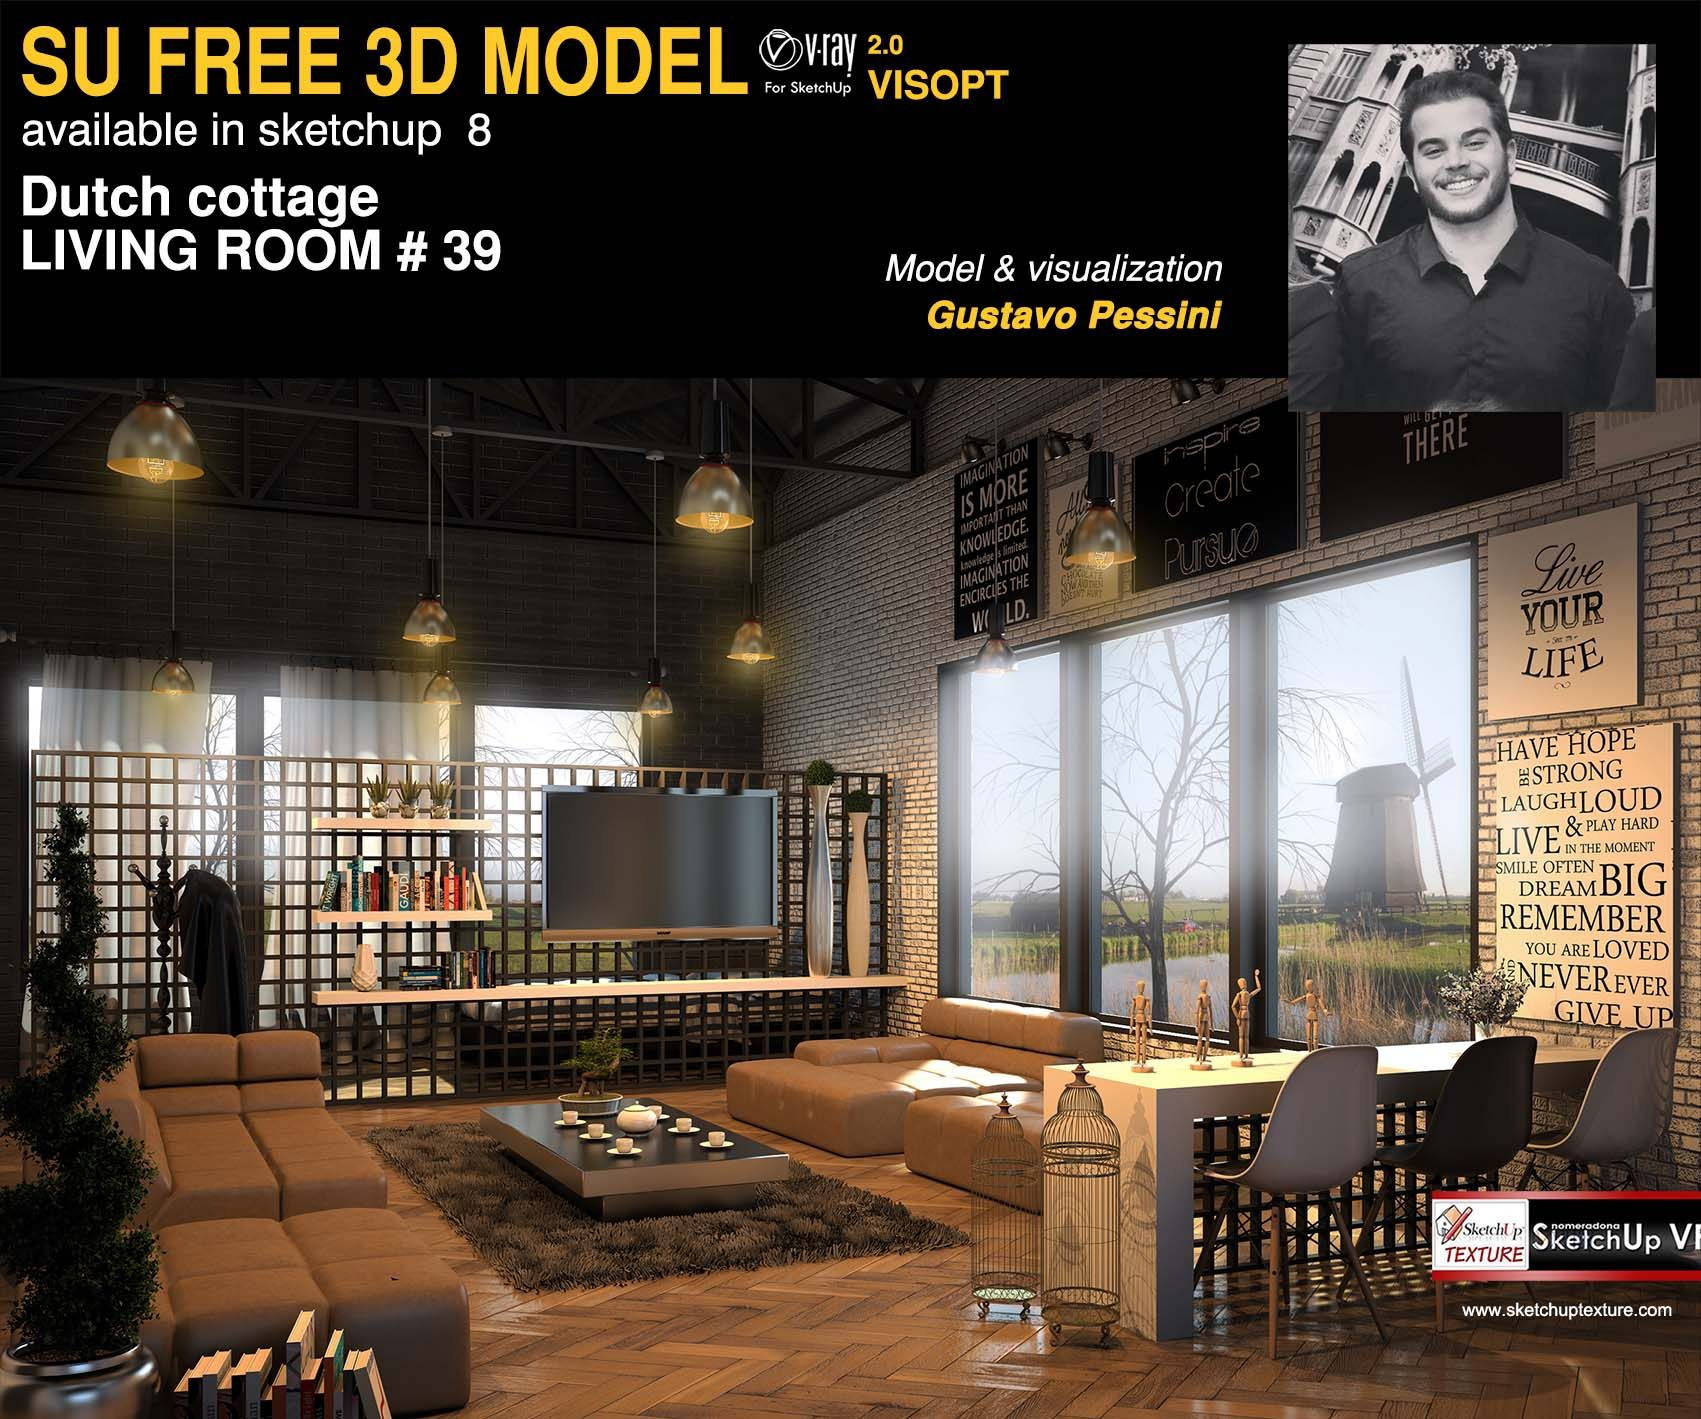 Stunning Free Sketchup Model Dutch Cottage Living Room #39